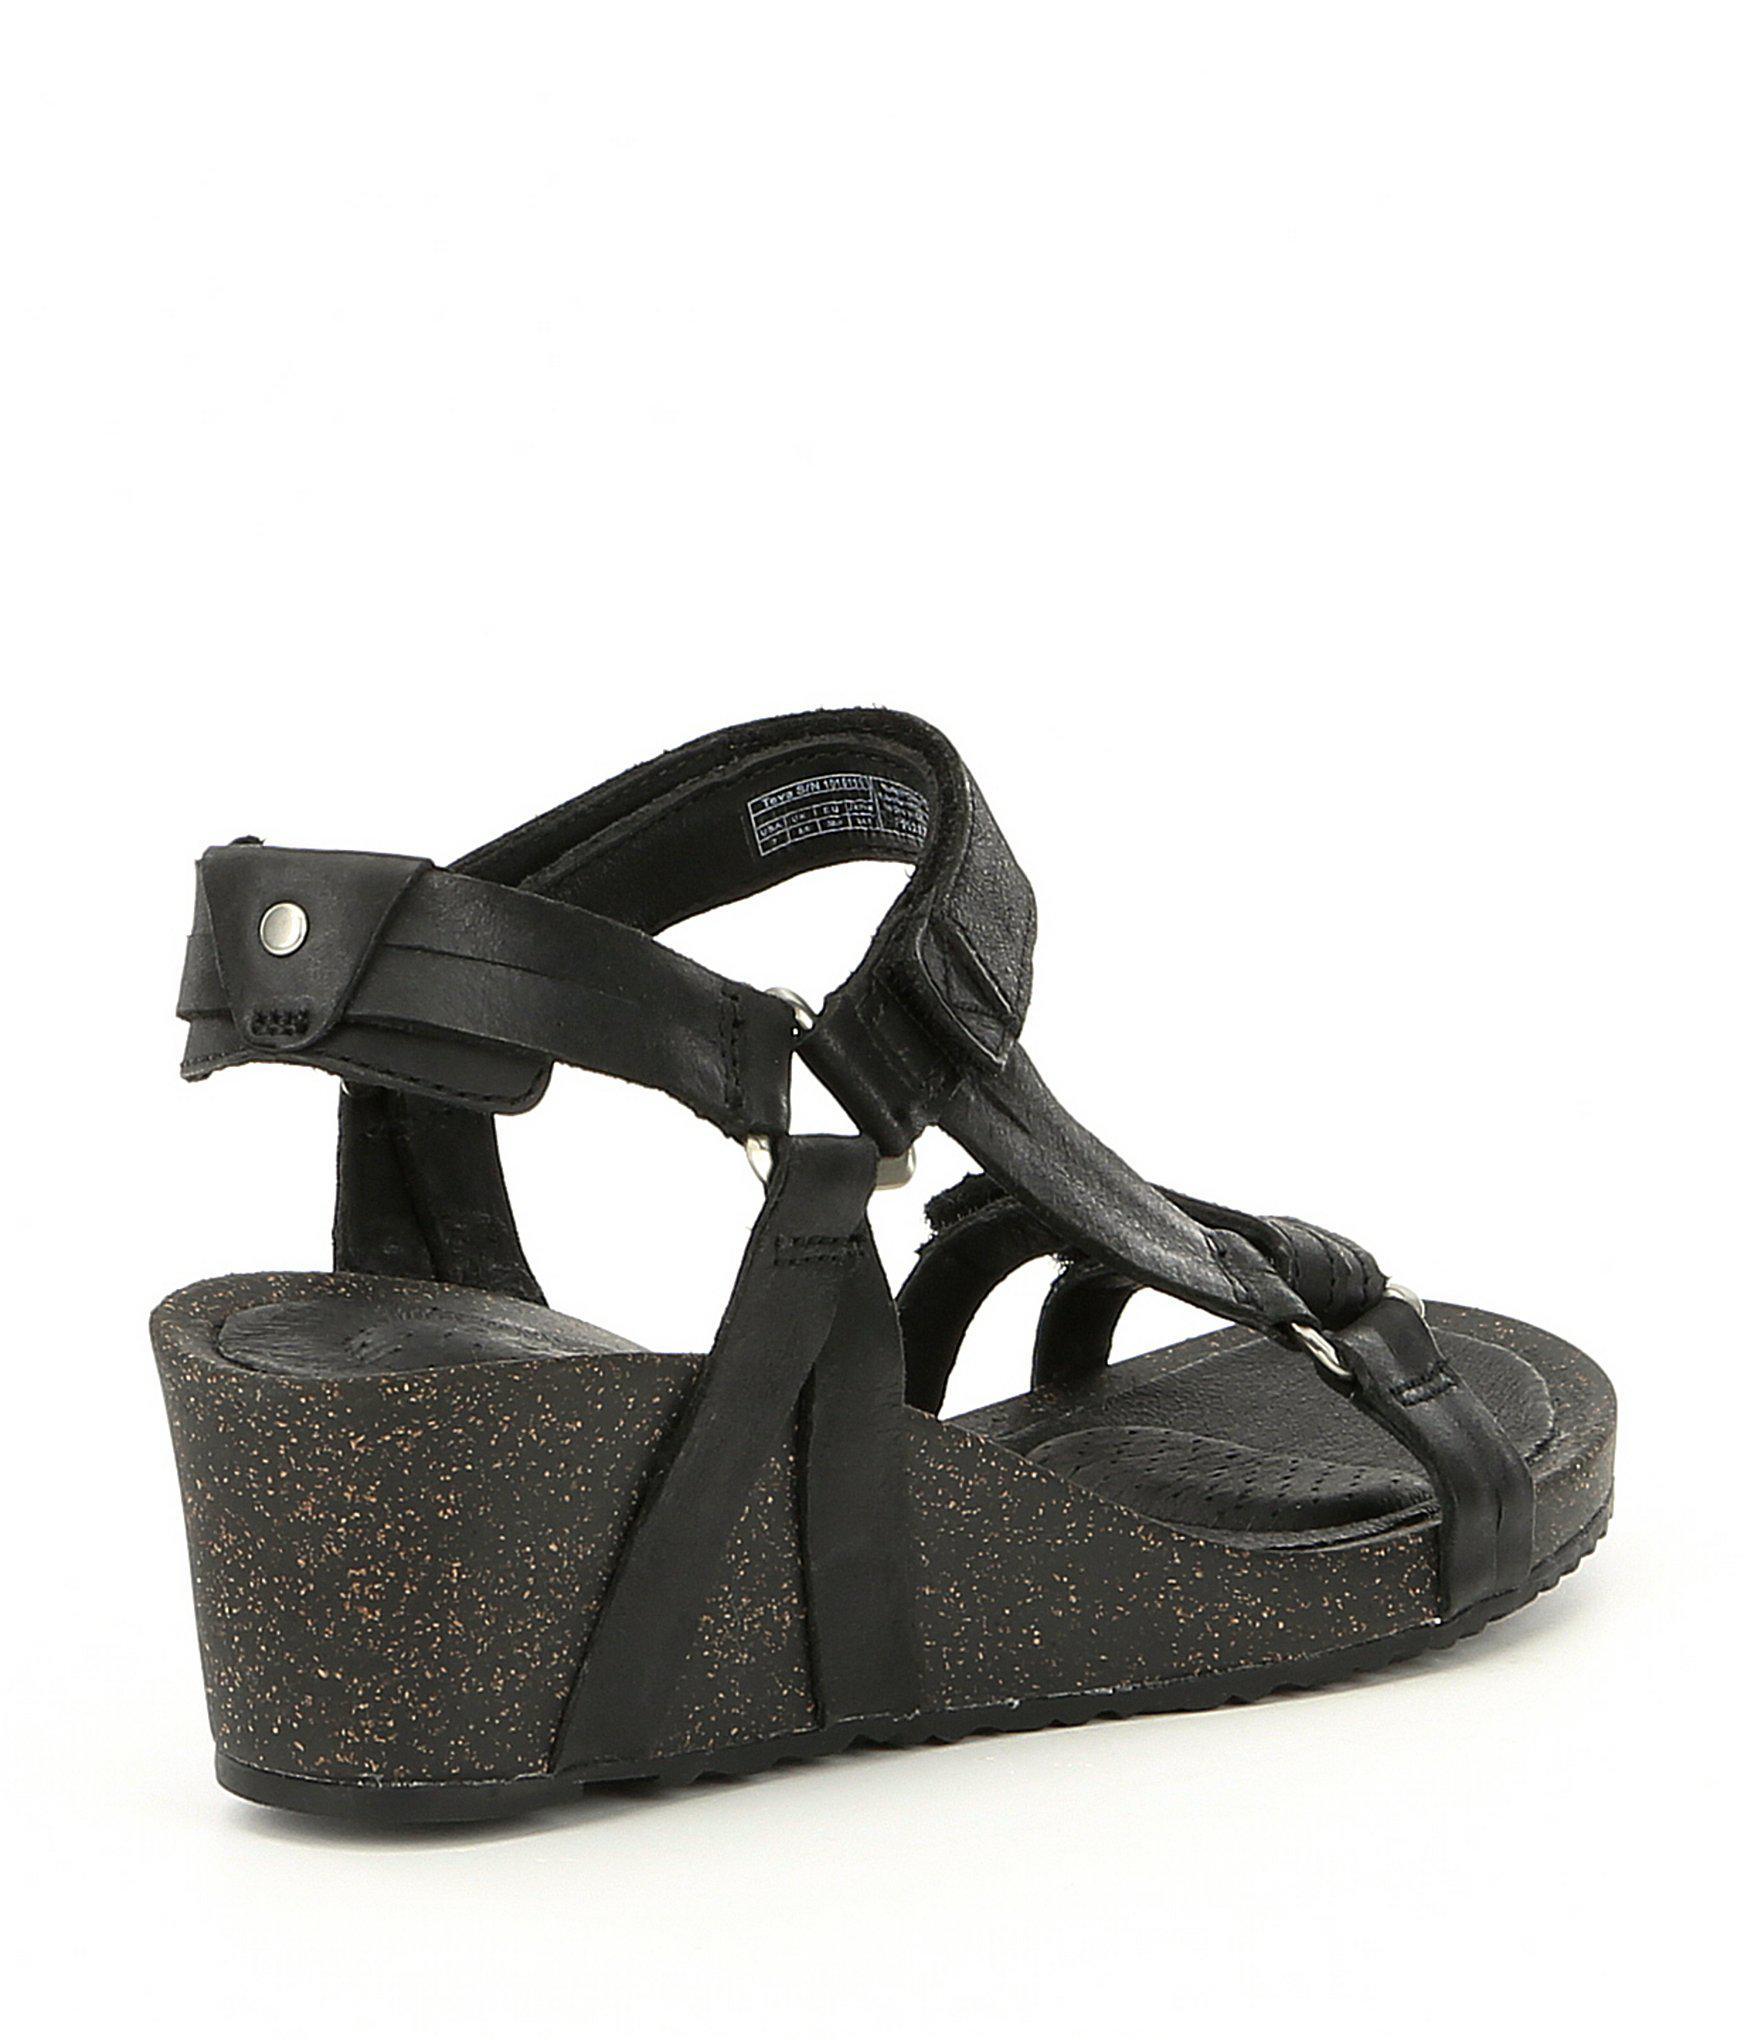 bbf41f840356c Teva - Black Ysidro Universal Wedge Sandals - Lyst. View fullscreen